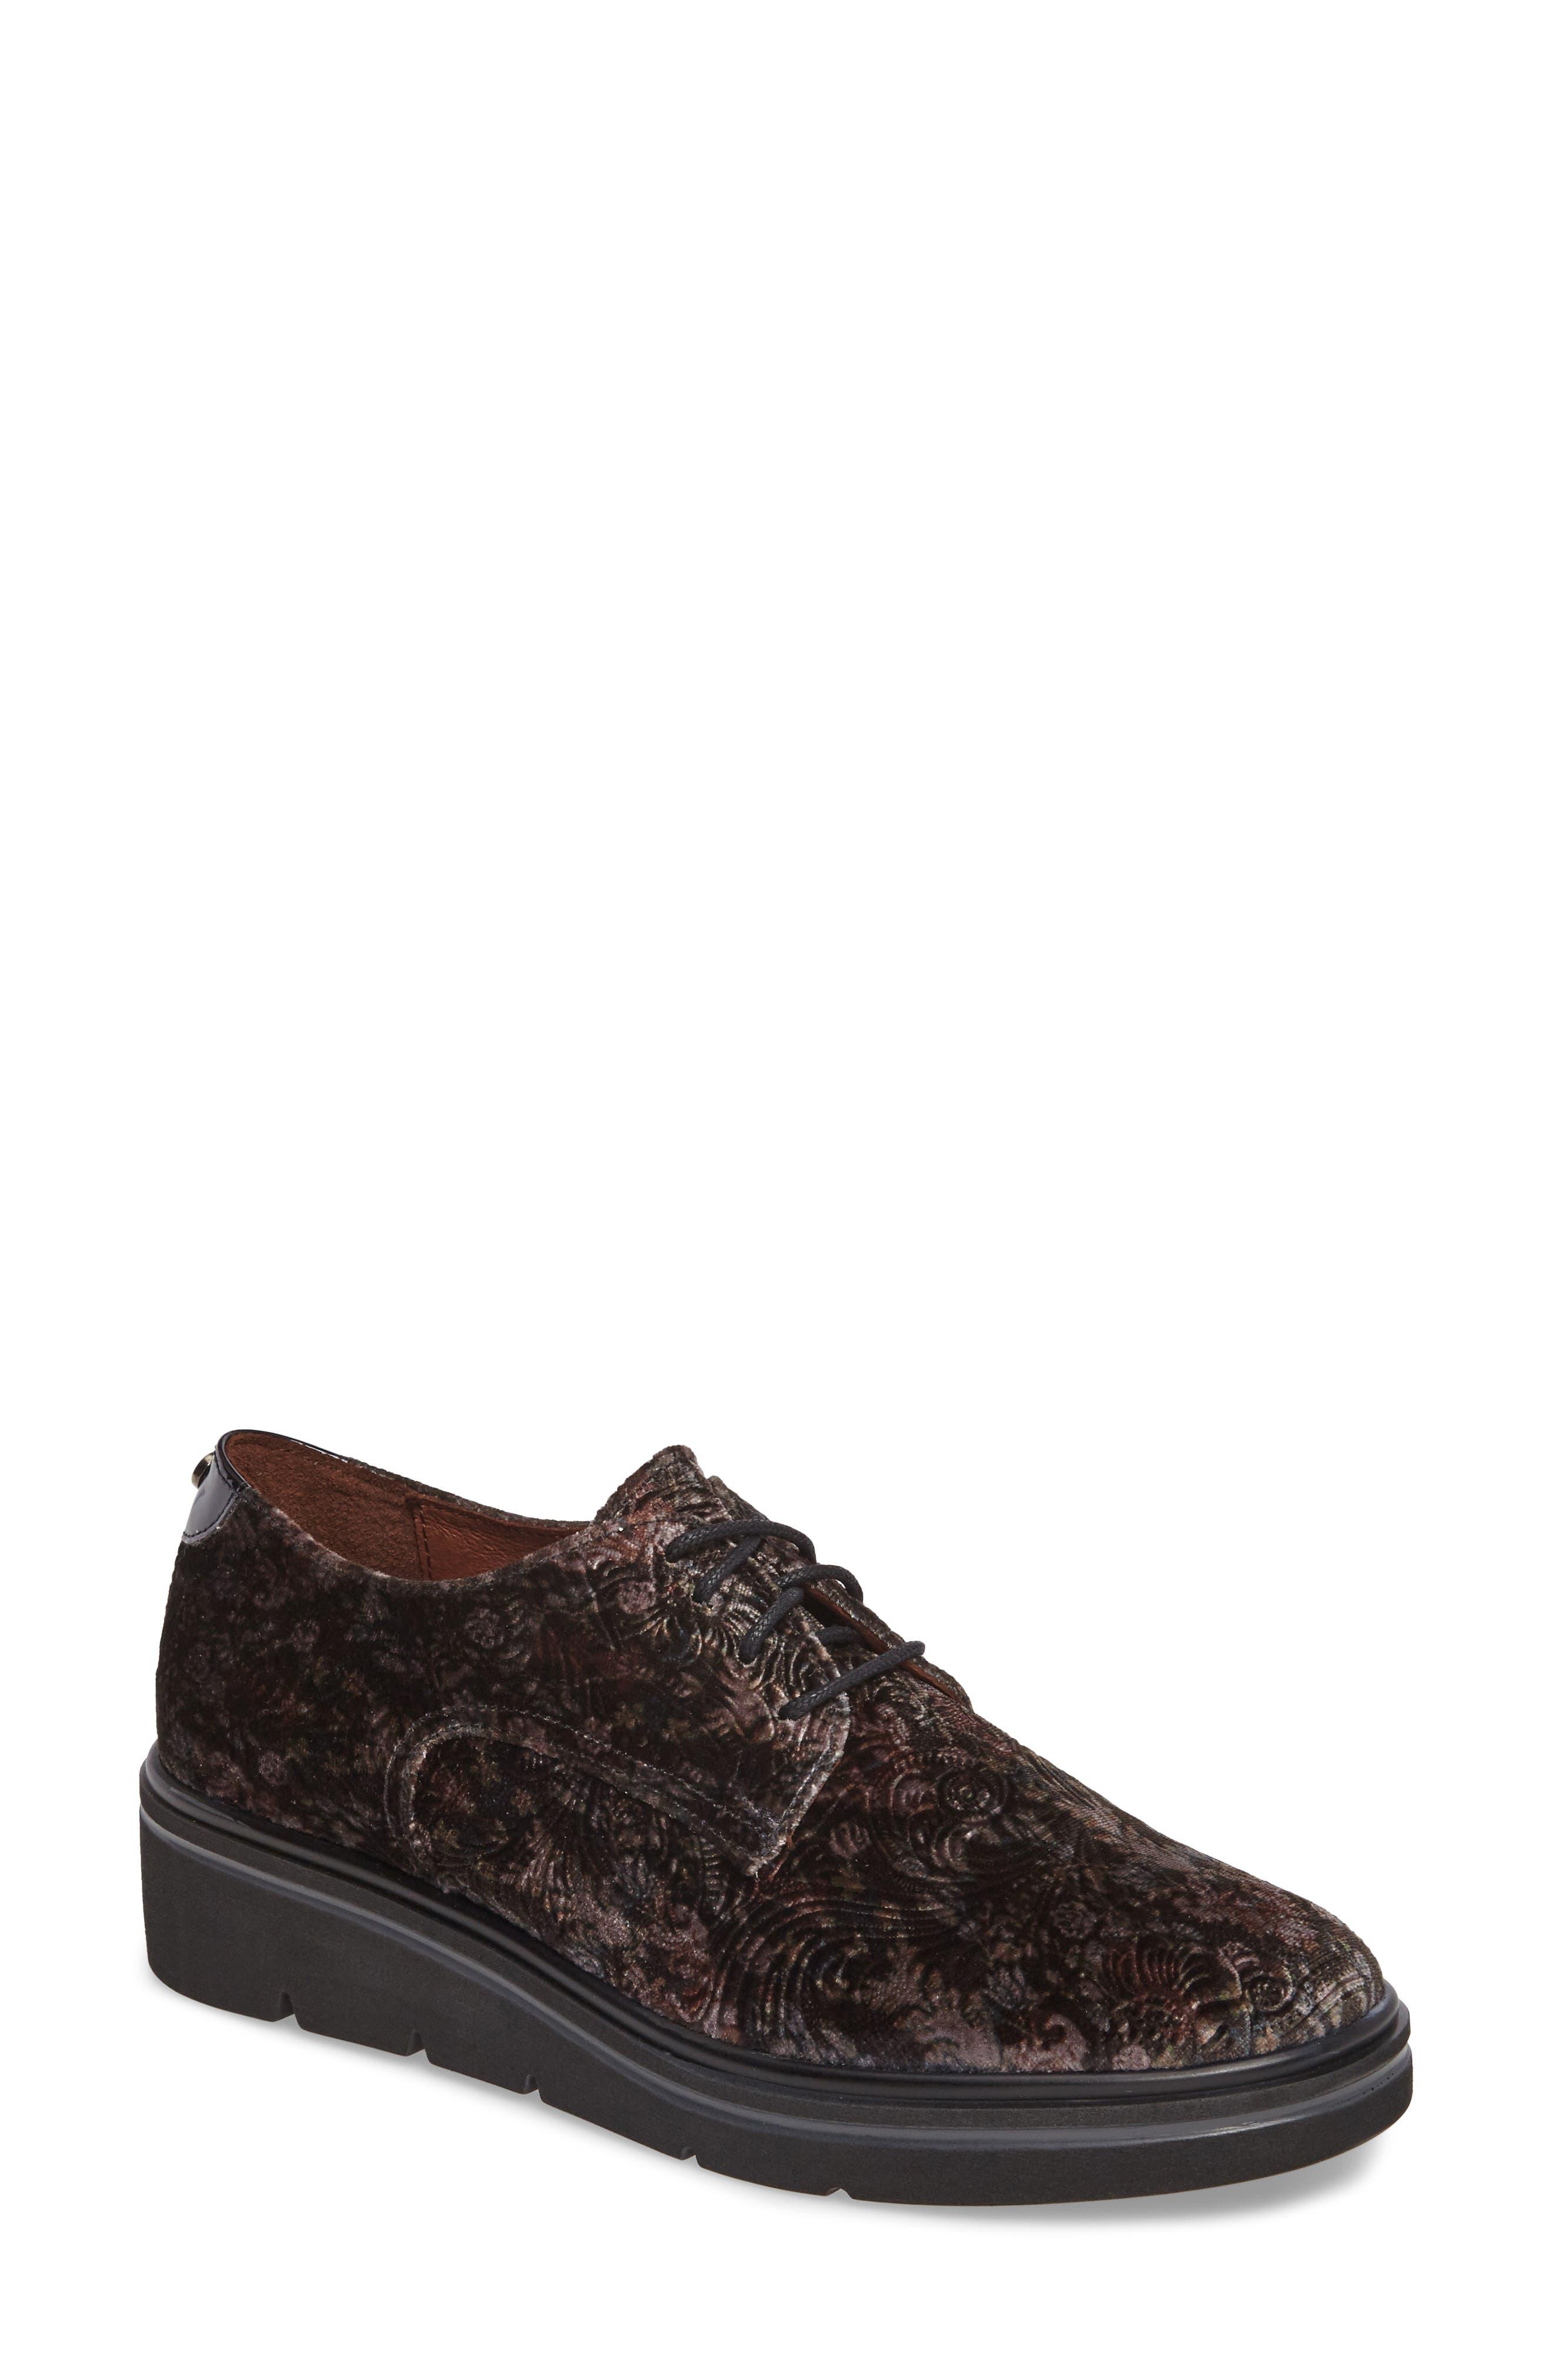 Richelle Oxford Sneaker,                             Main thumbnail 1, color,                             GREY FABRIC